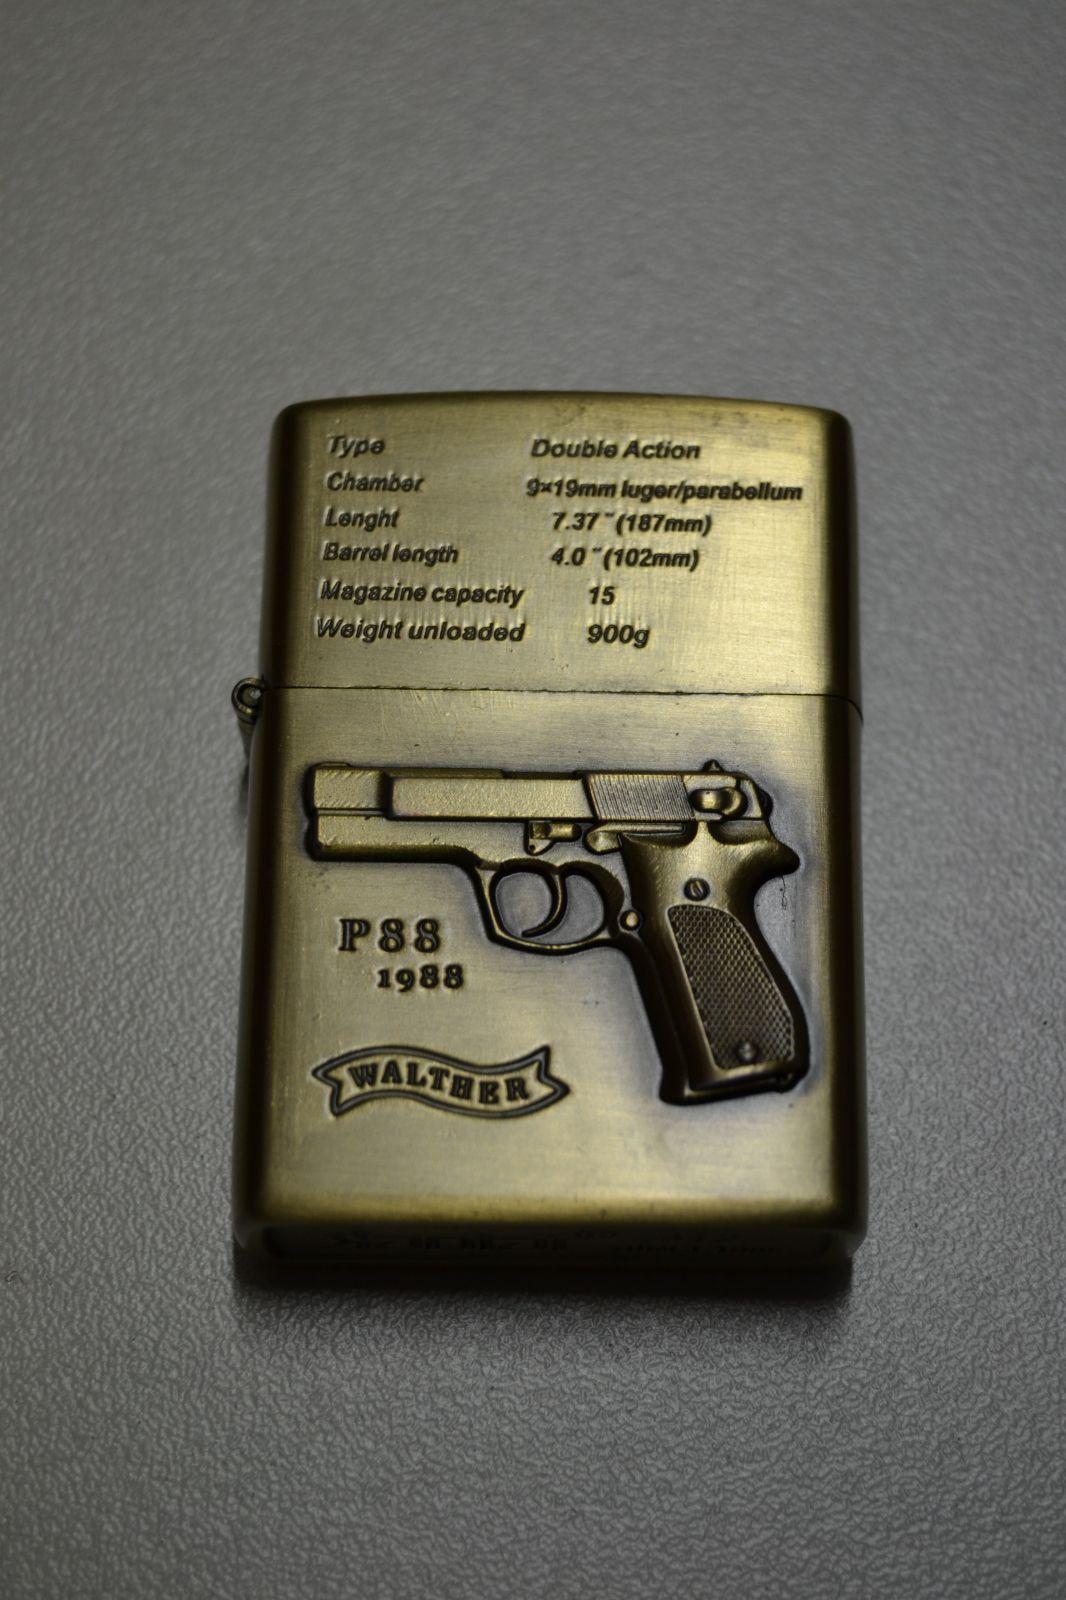 BENZÍNOVÝ ZAPALOVAČ Č.11 - pistole walther P88 1988